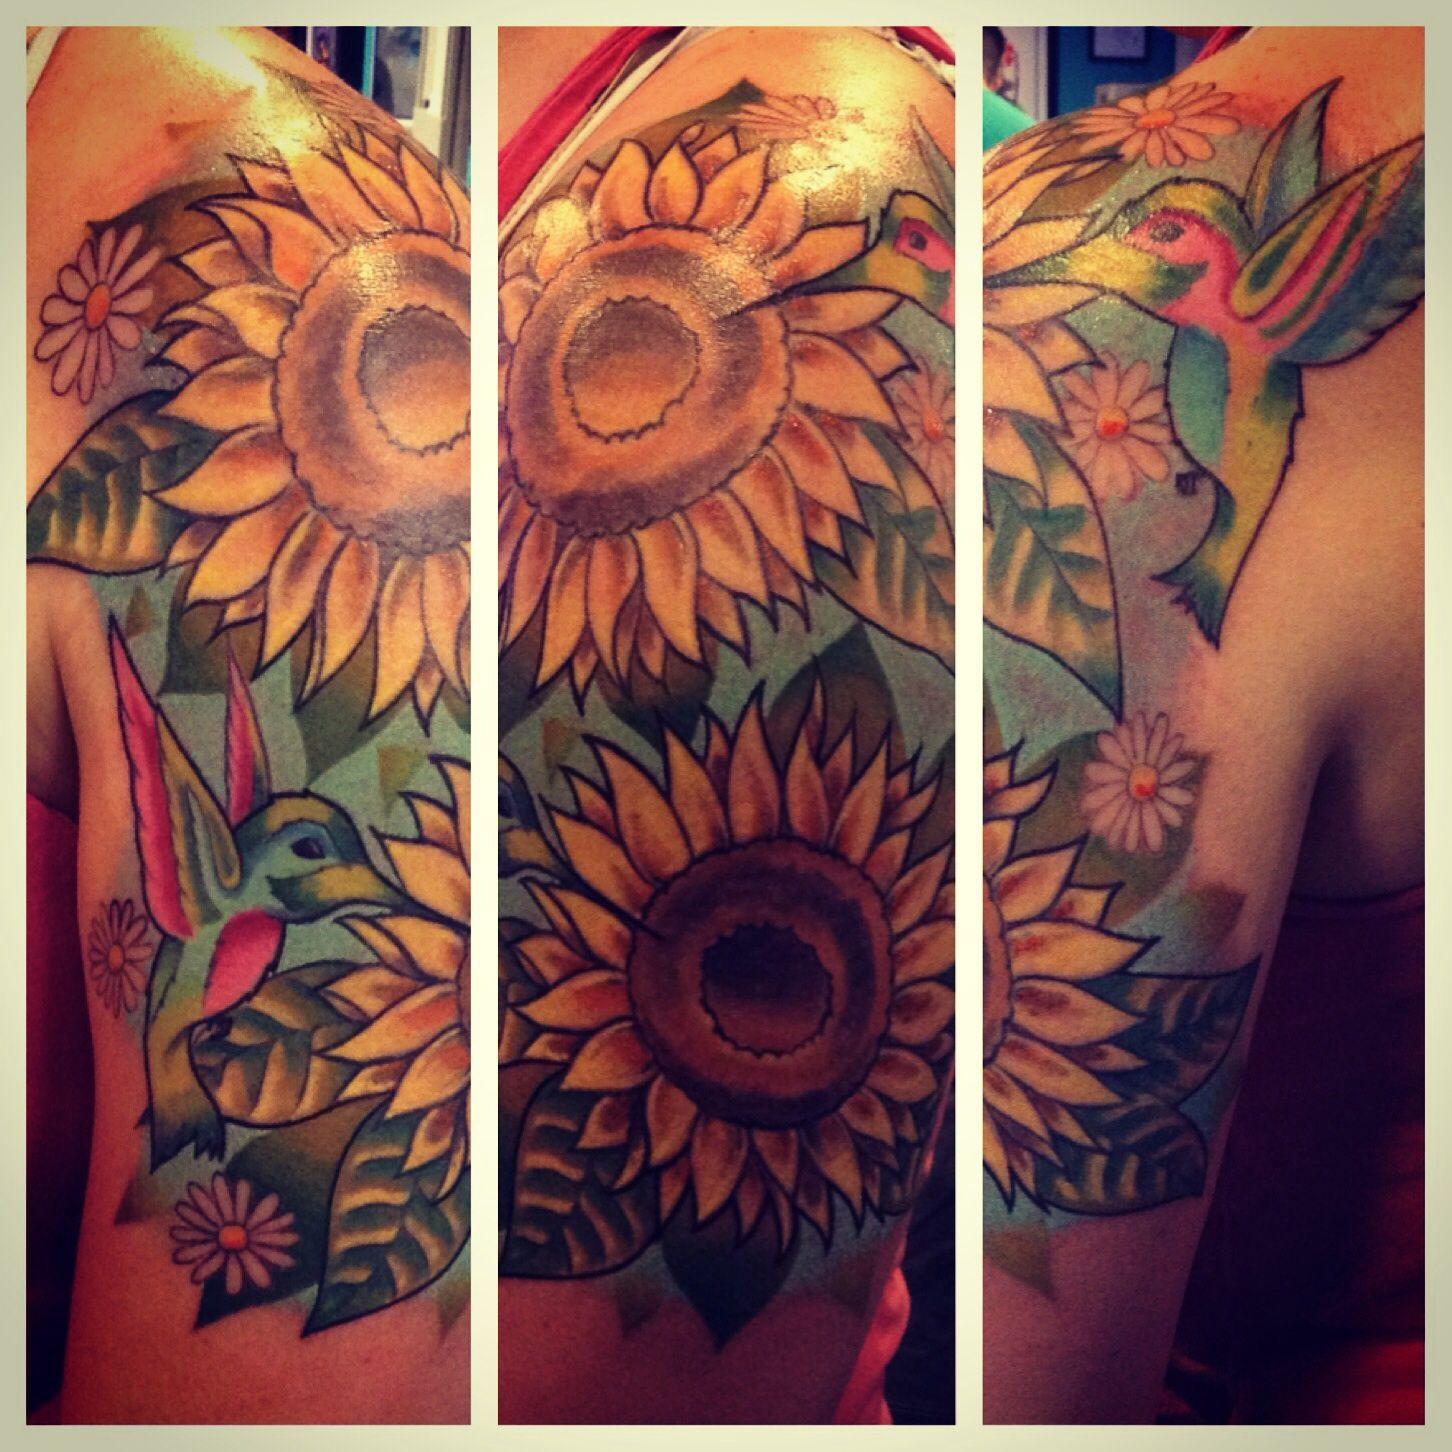 All views of a custom sunflower and hummingbird tattoo I did